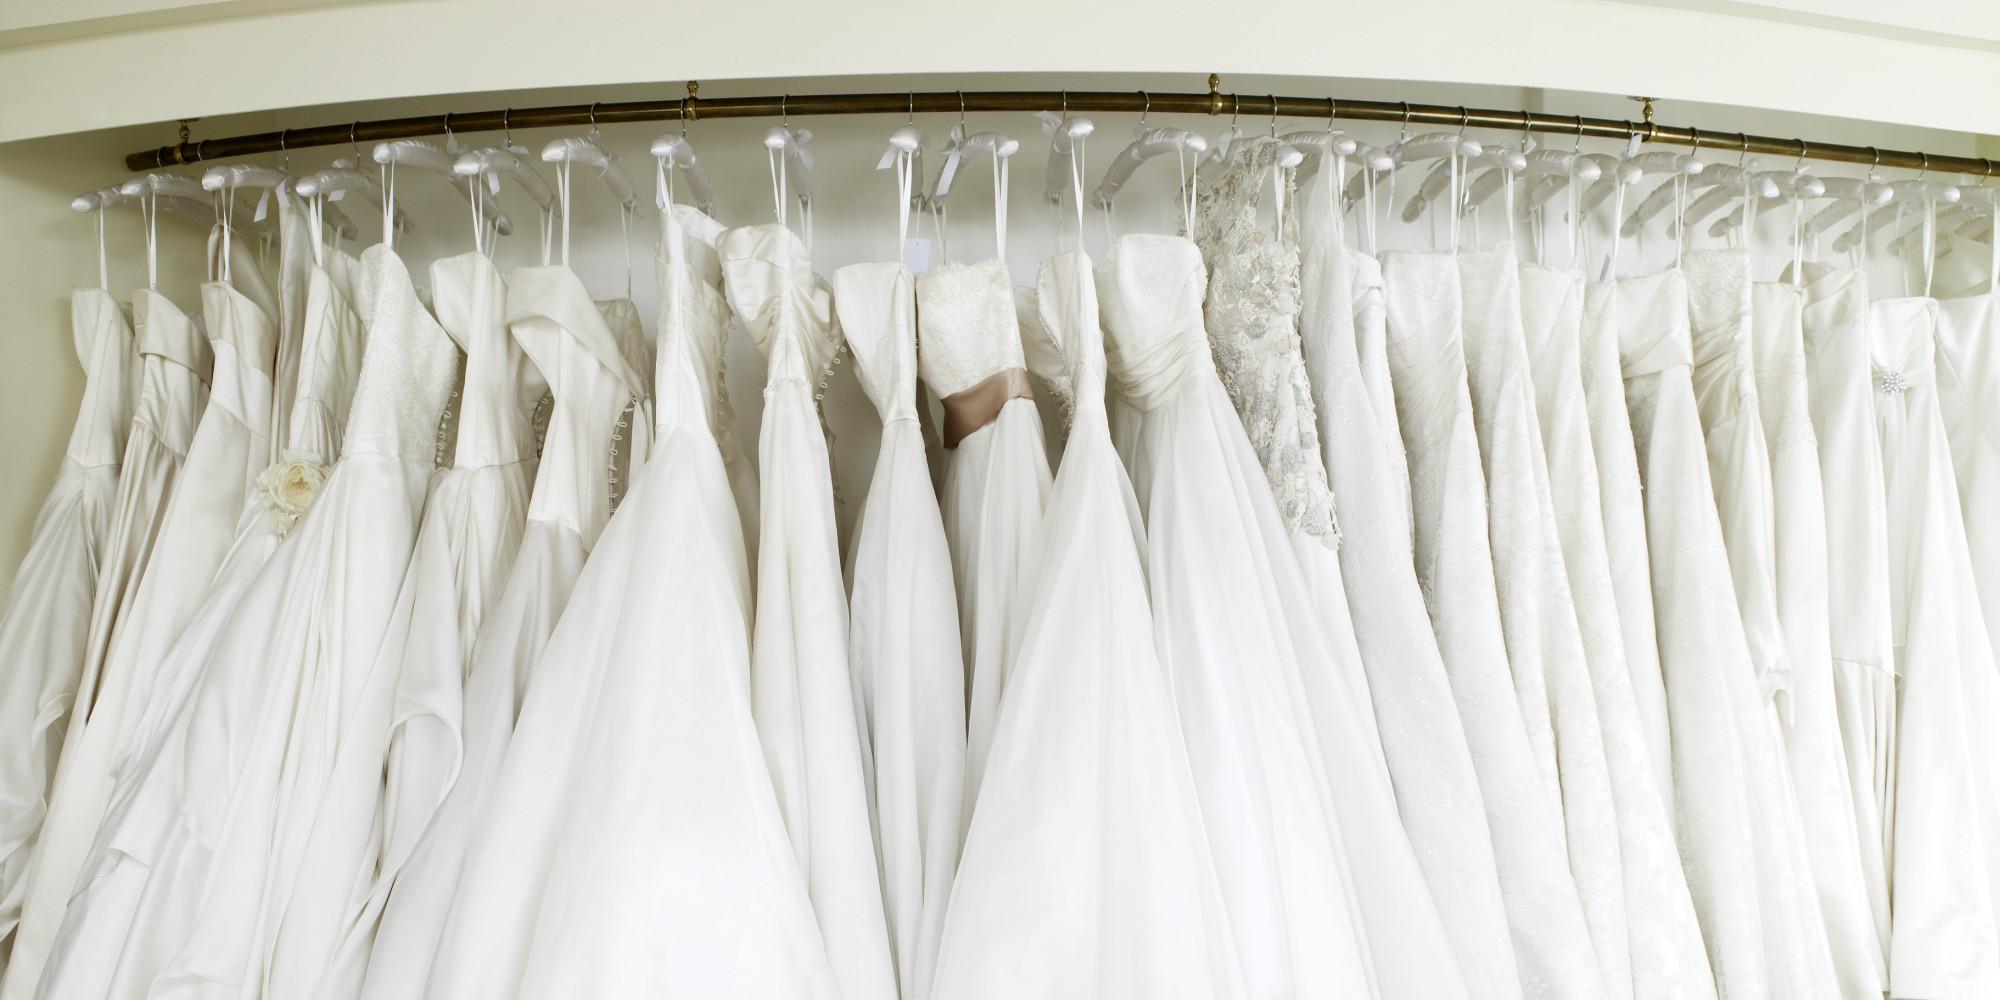 Best Bridal Stores In Toronto: Top Eight Wedding Dress Salons